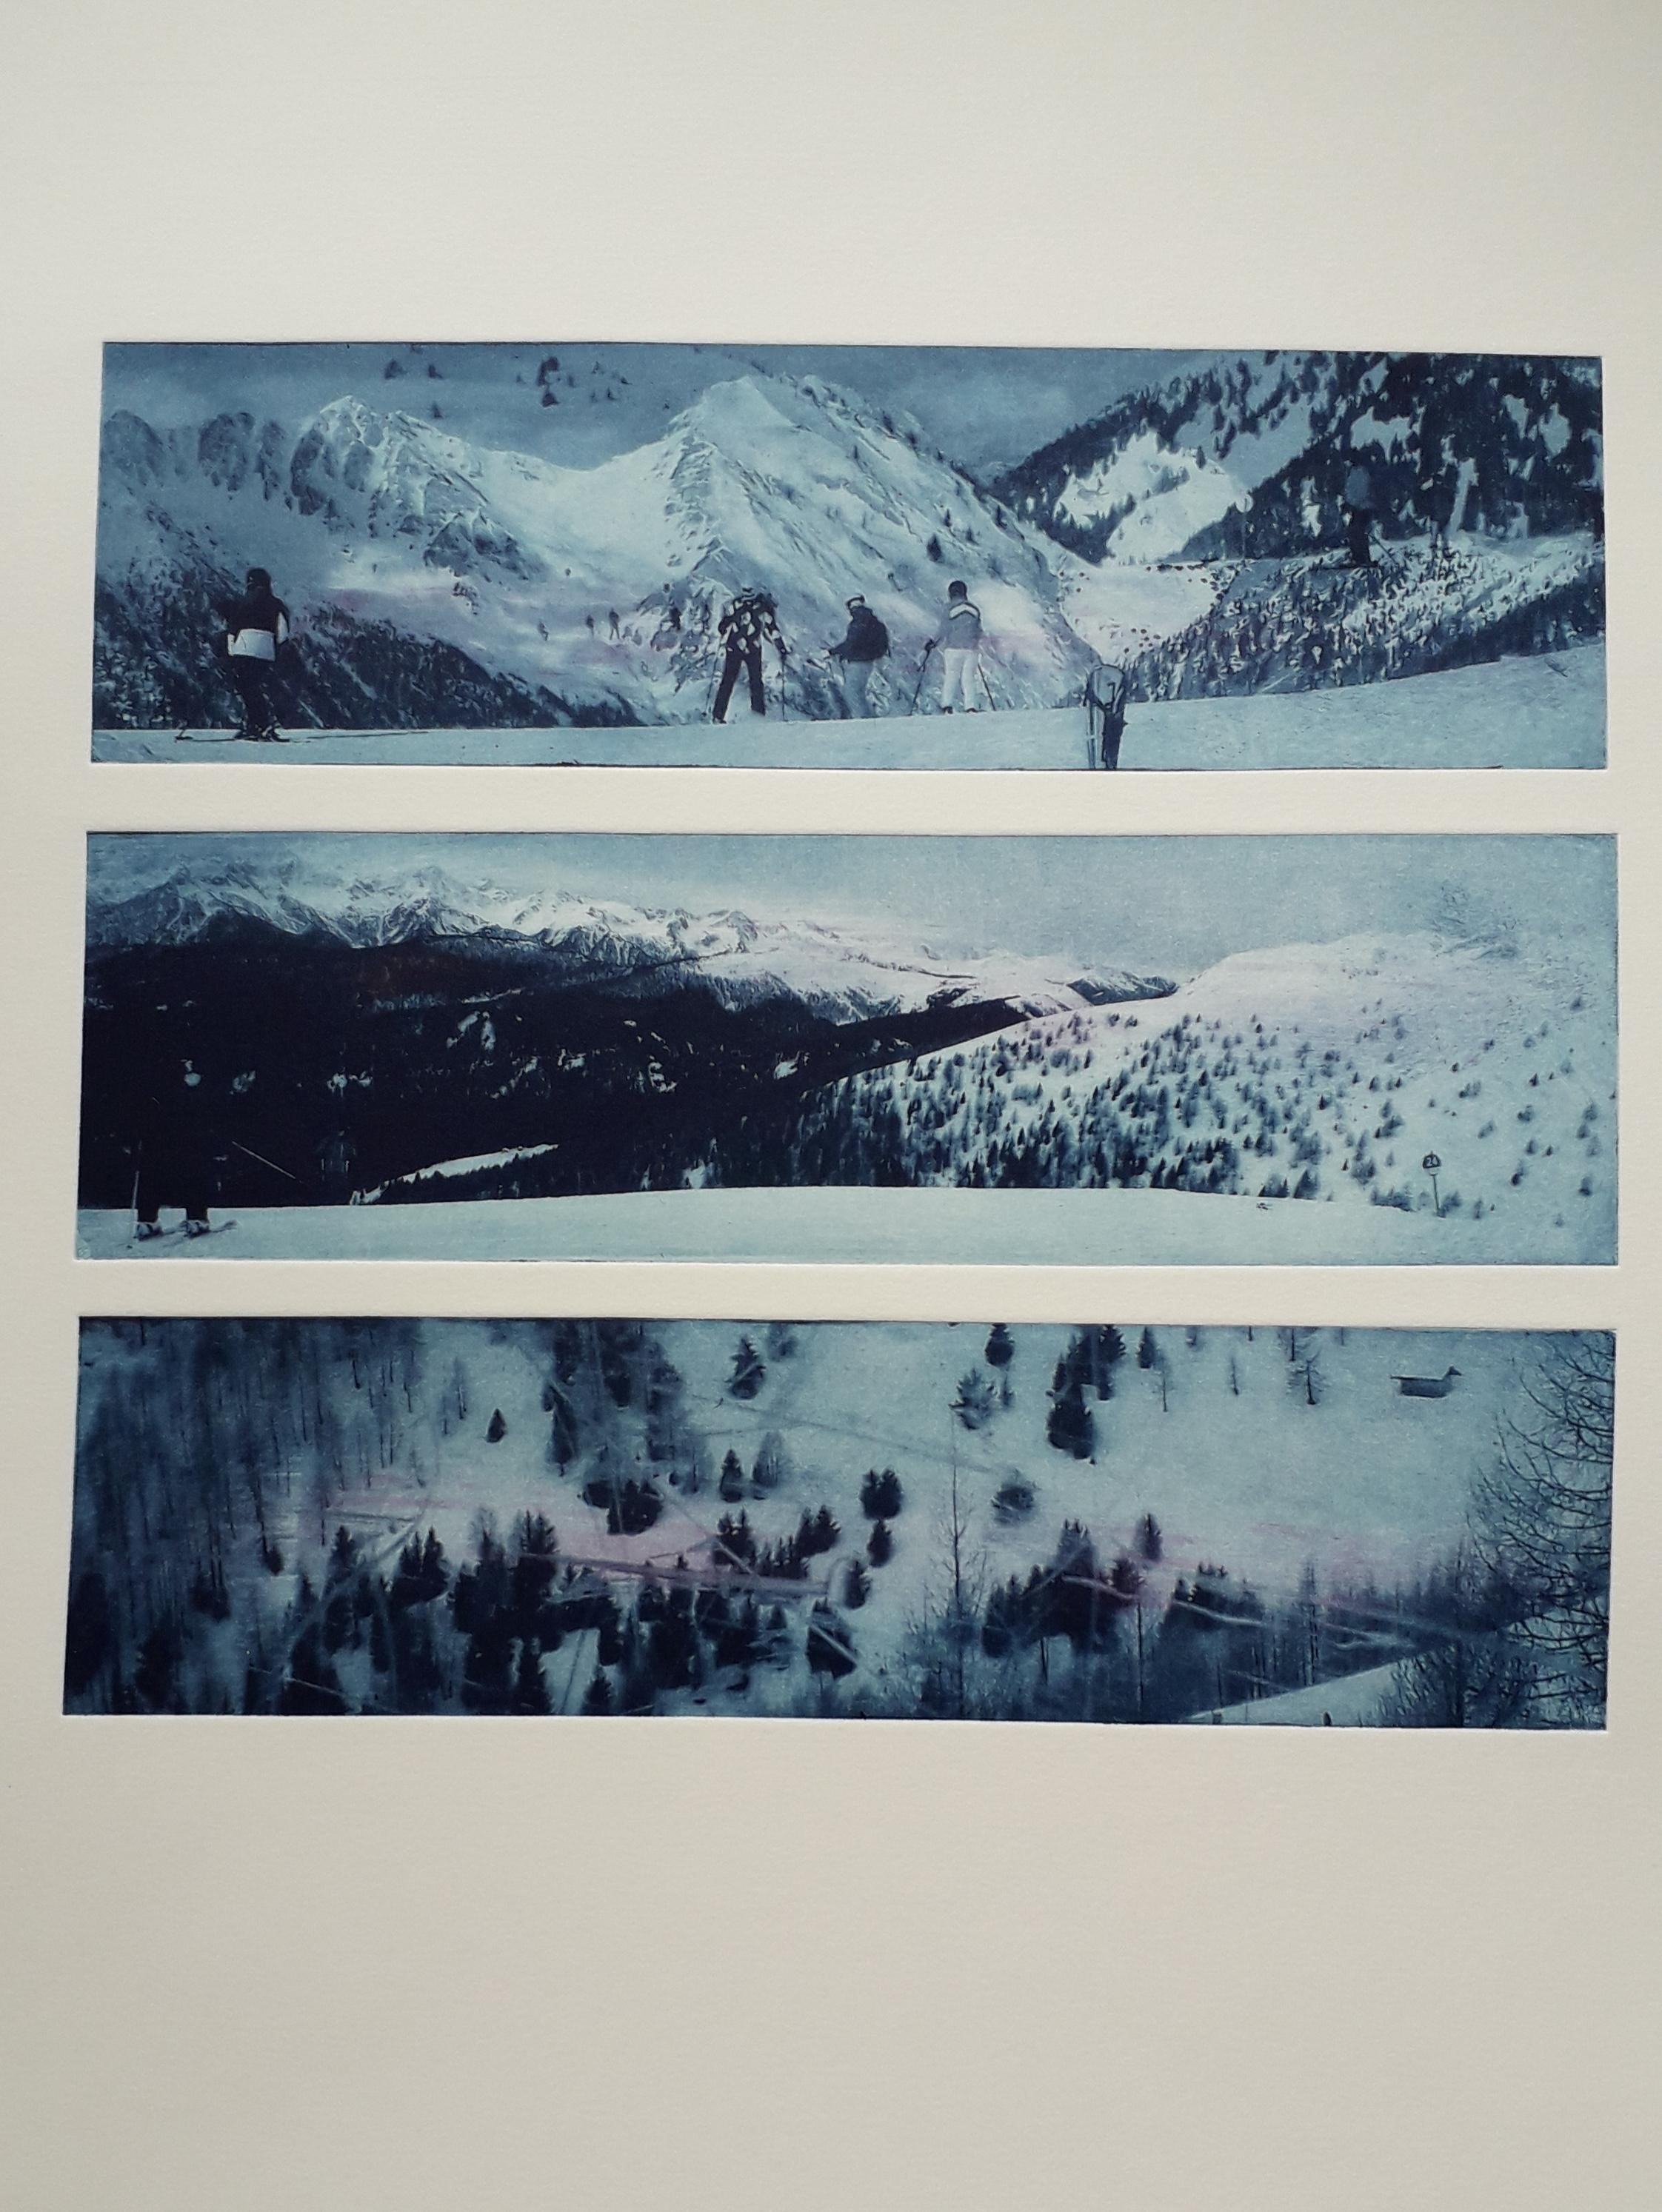 4. Snow, Ice, Vals.jpg